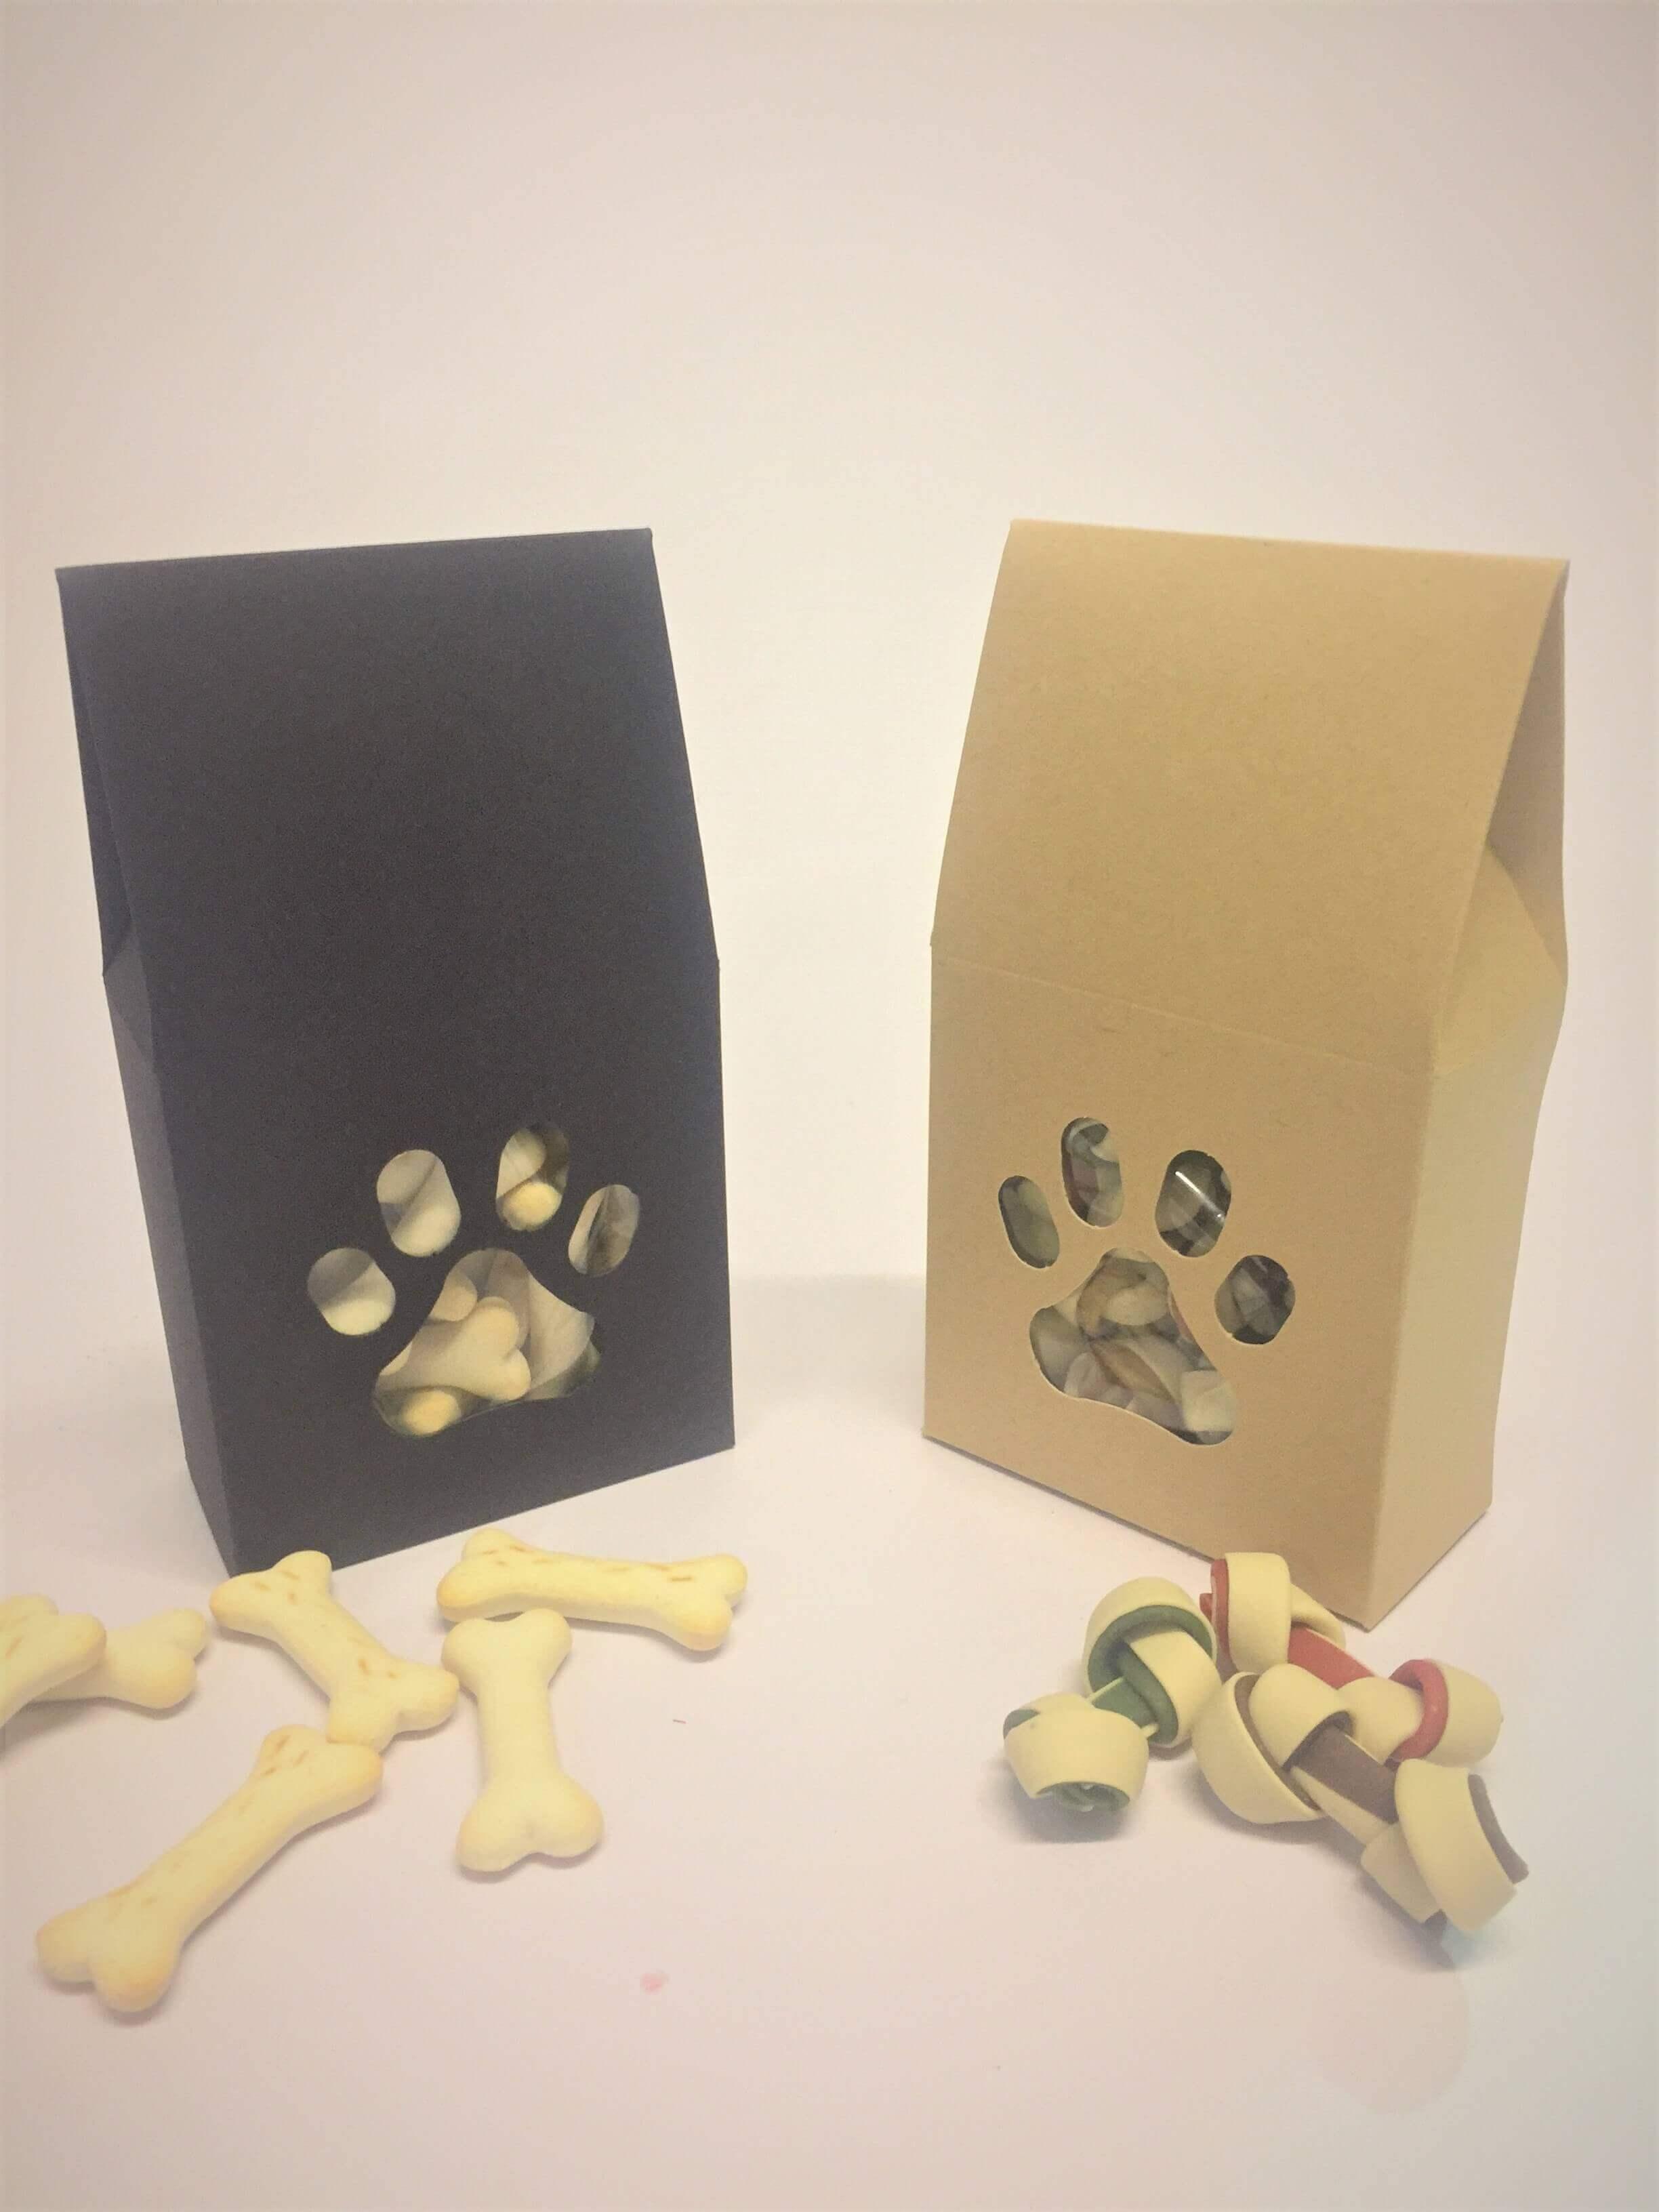 Doggie Treat Boxes in Kraft or Black Board